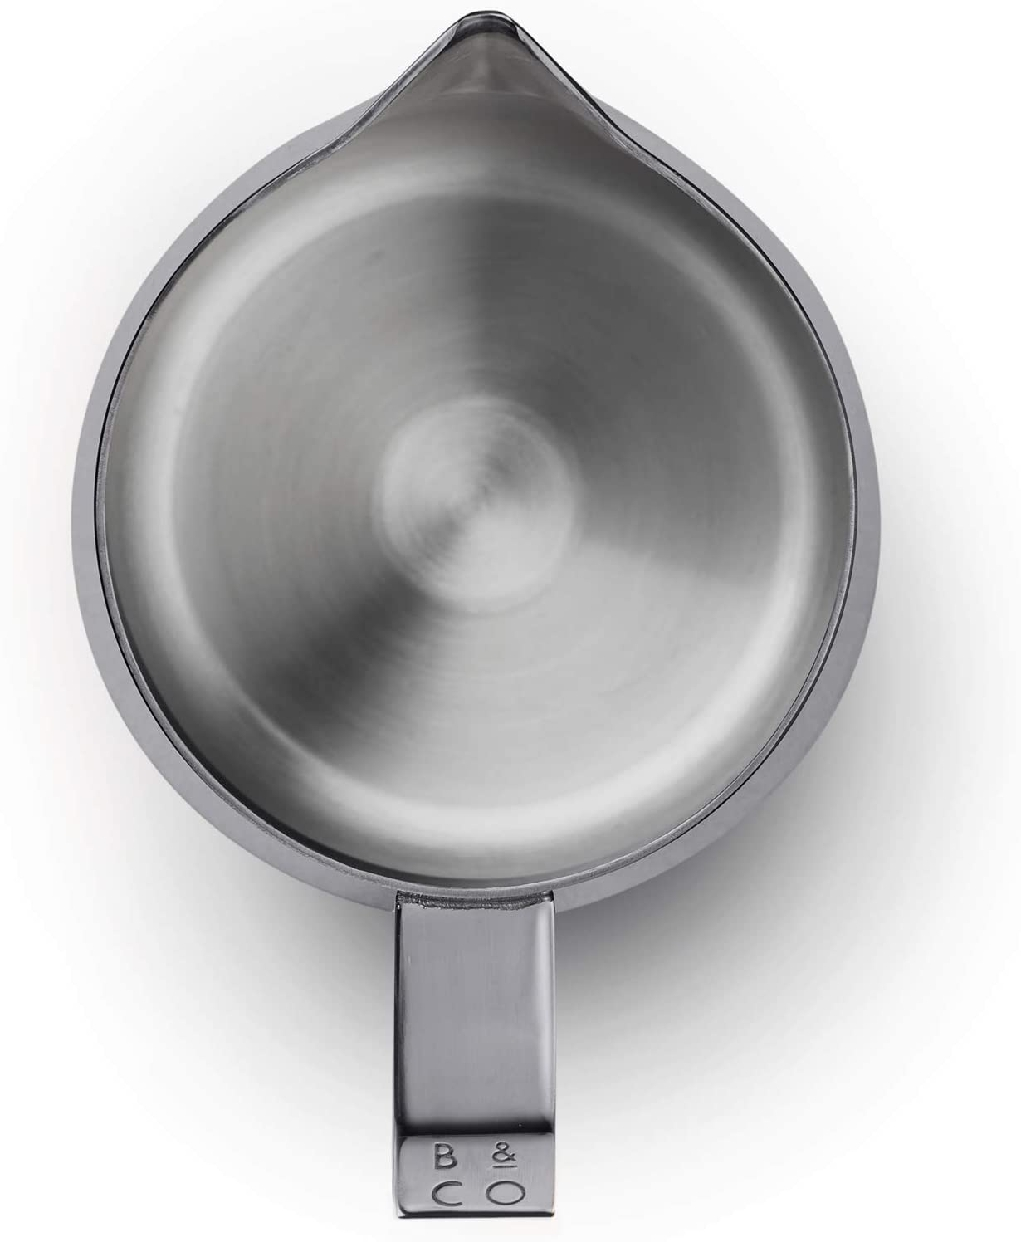 Barista&Co(バリスタアンドコー)Dial In milk Pitcher 600ml Blackの商品画像5